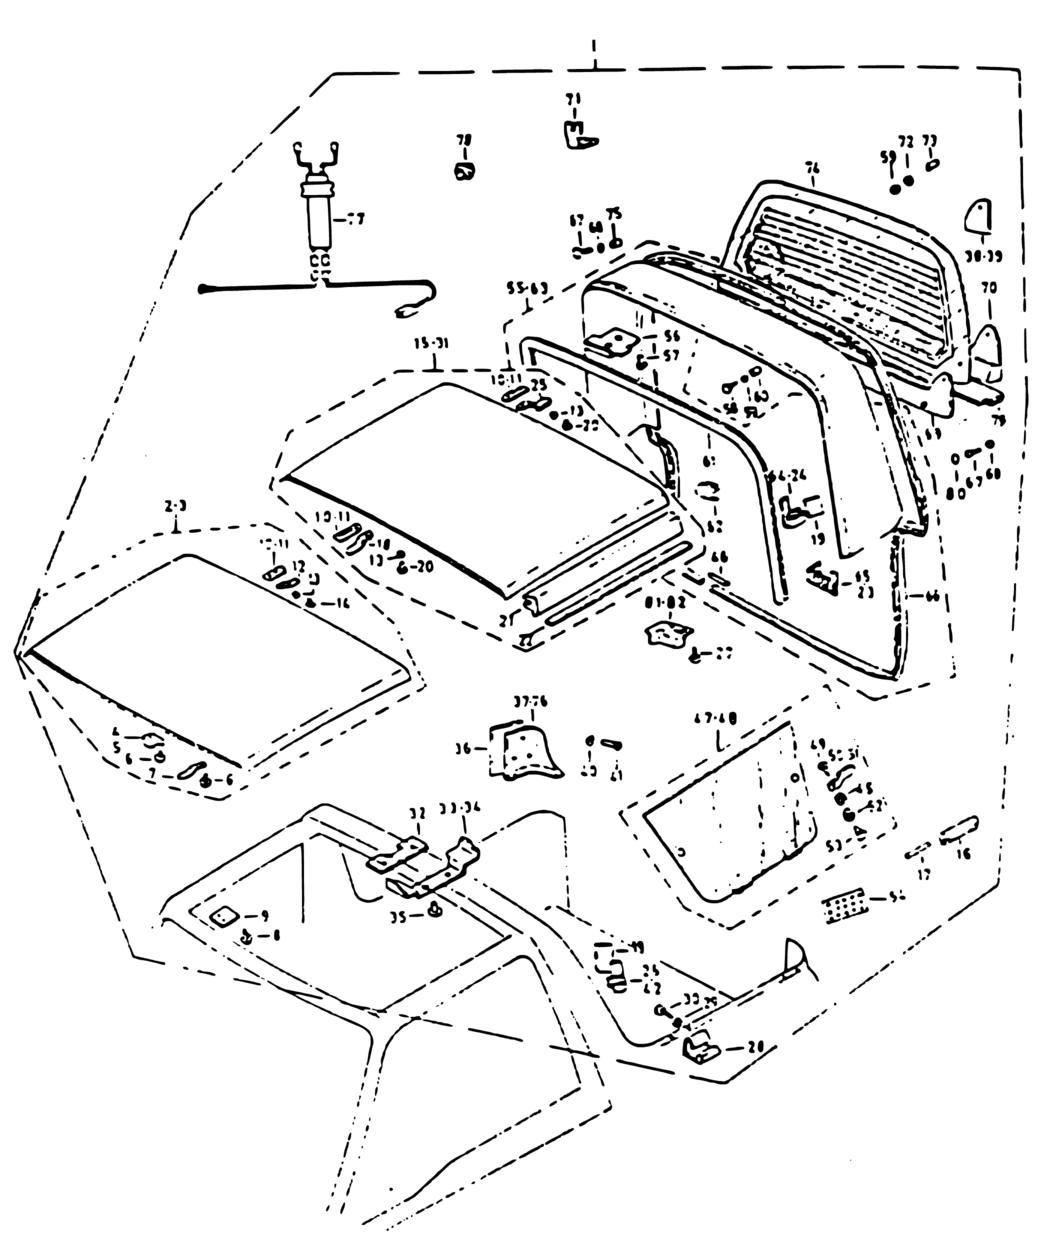 WRG-1056] Nissan Elgrand Wiring Diagram E50 on